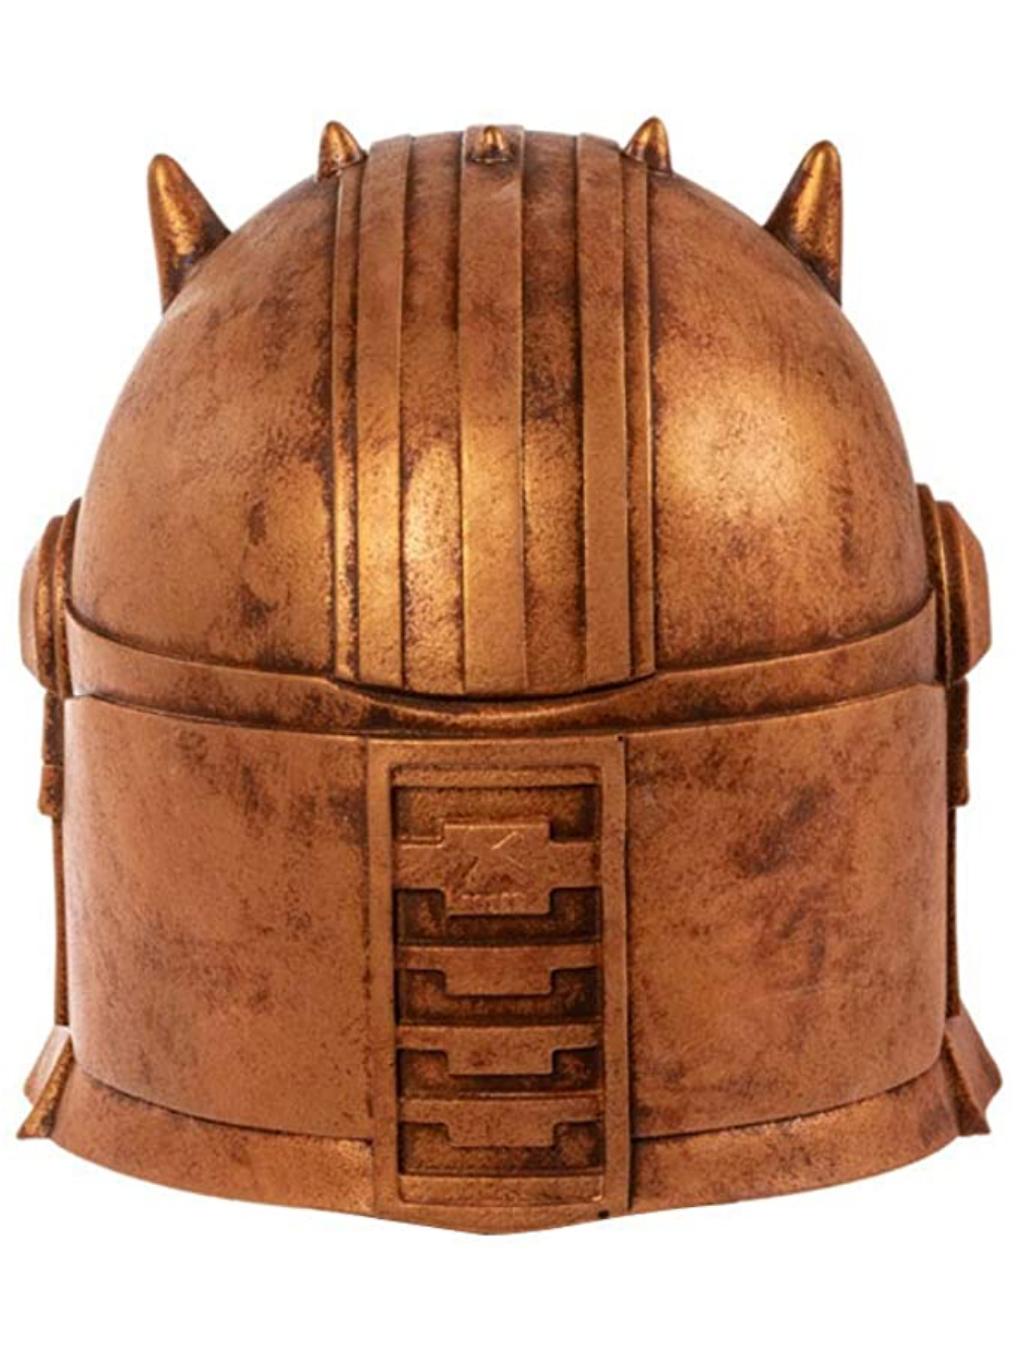 TM The Armorer Helmet Halloween Mask 4